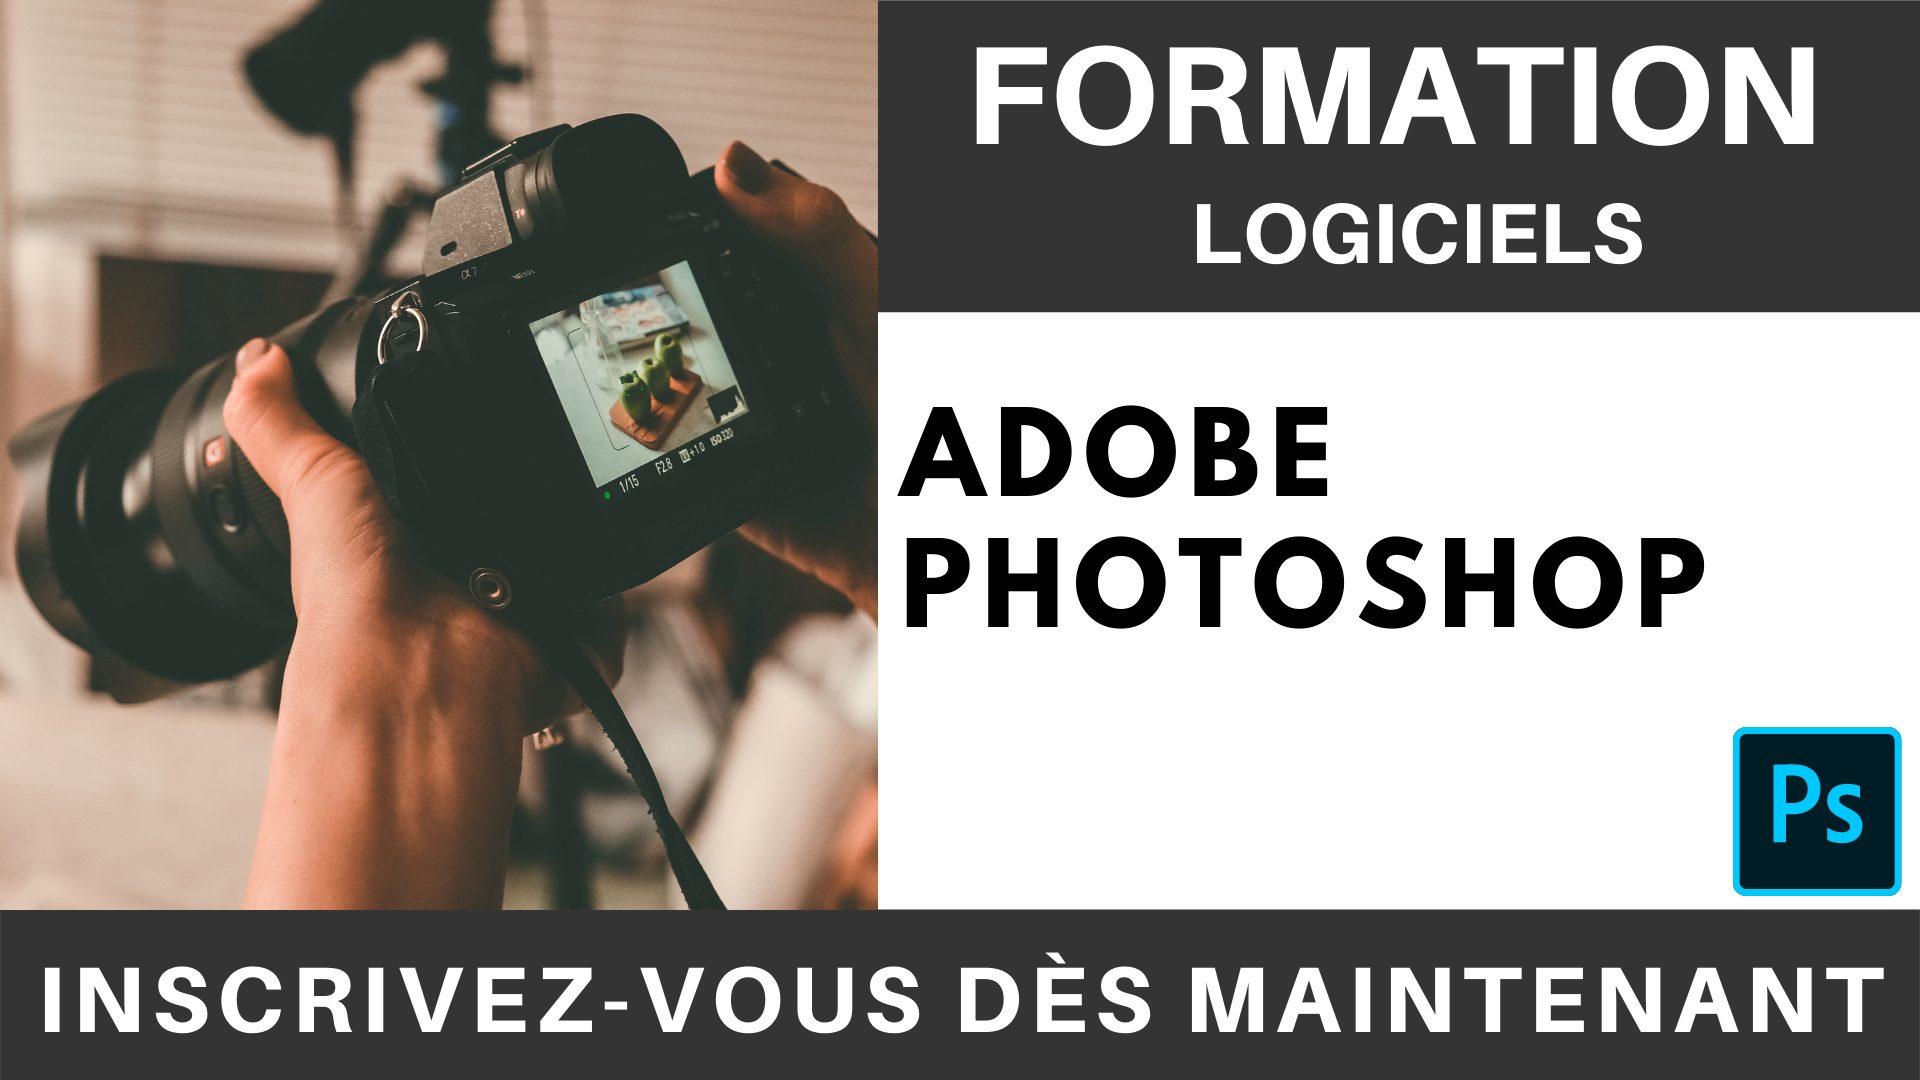 Formation LOGICIEL - Adobe Photoshop